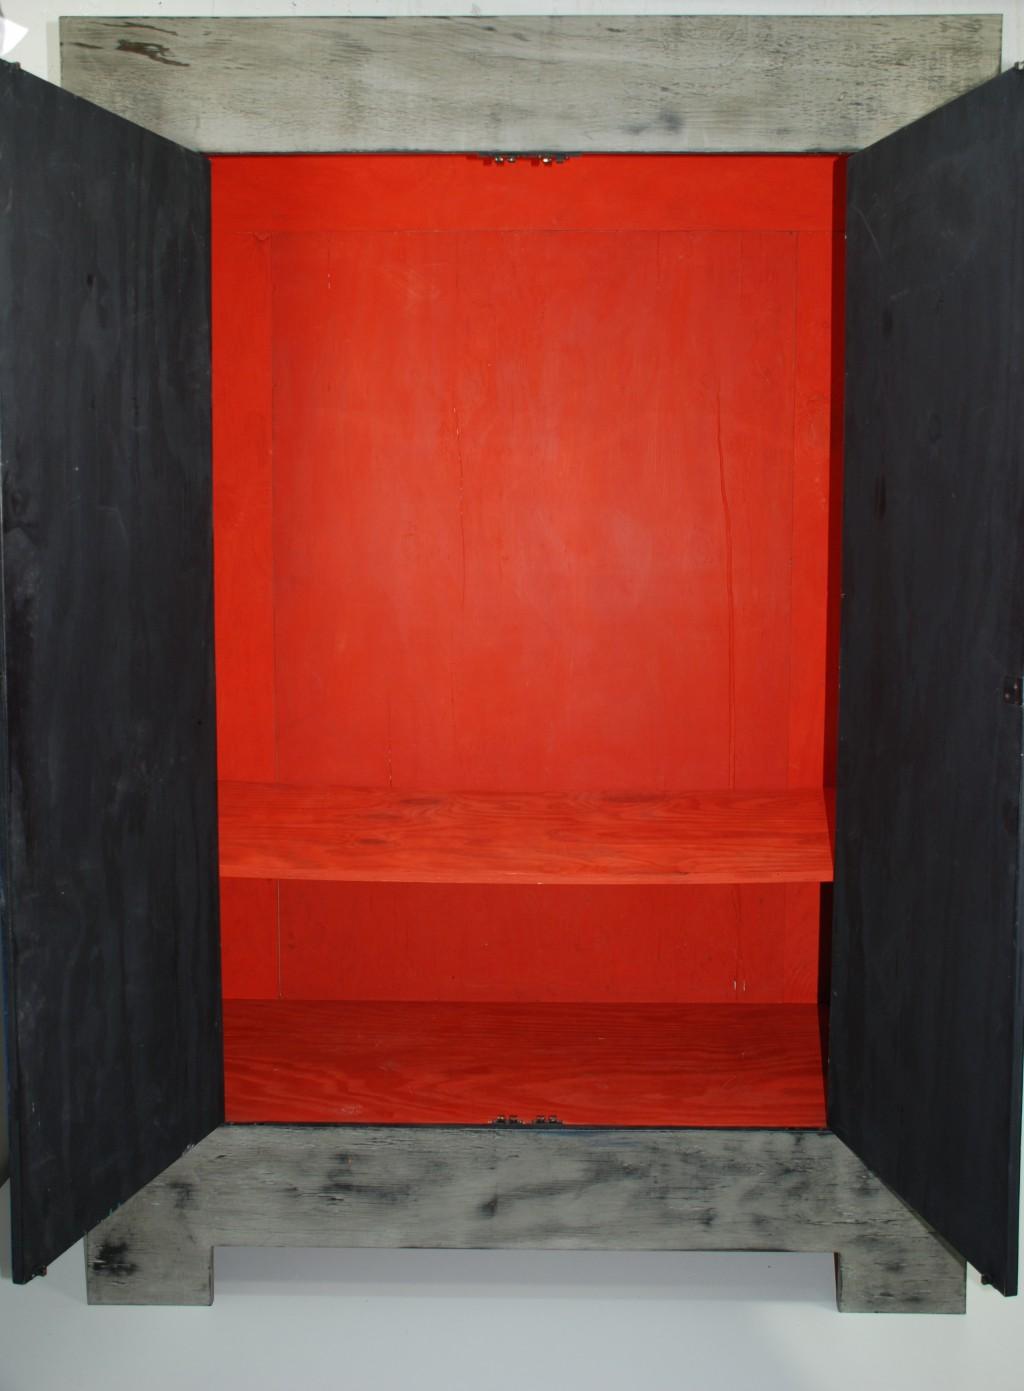 'Baldachin', Michael Growe 1998